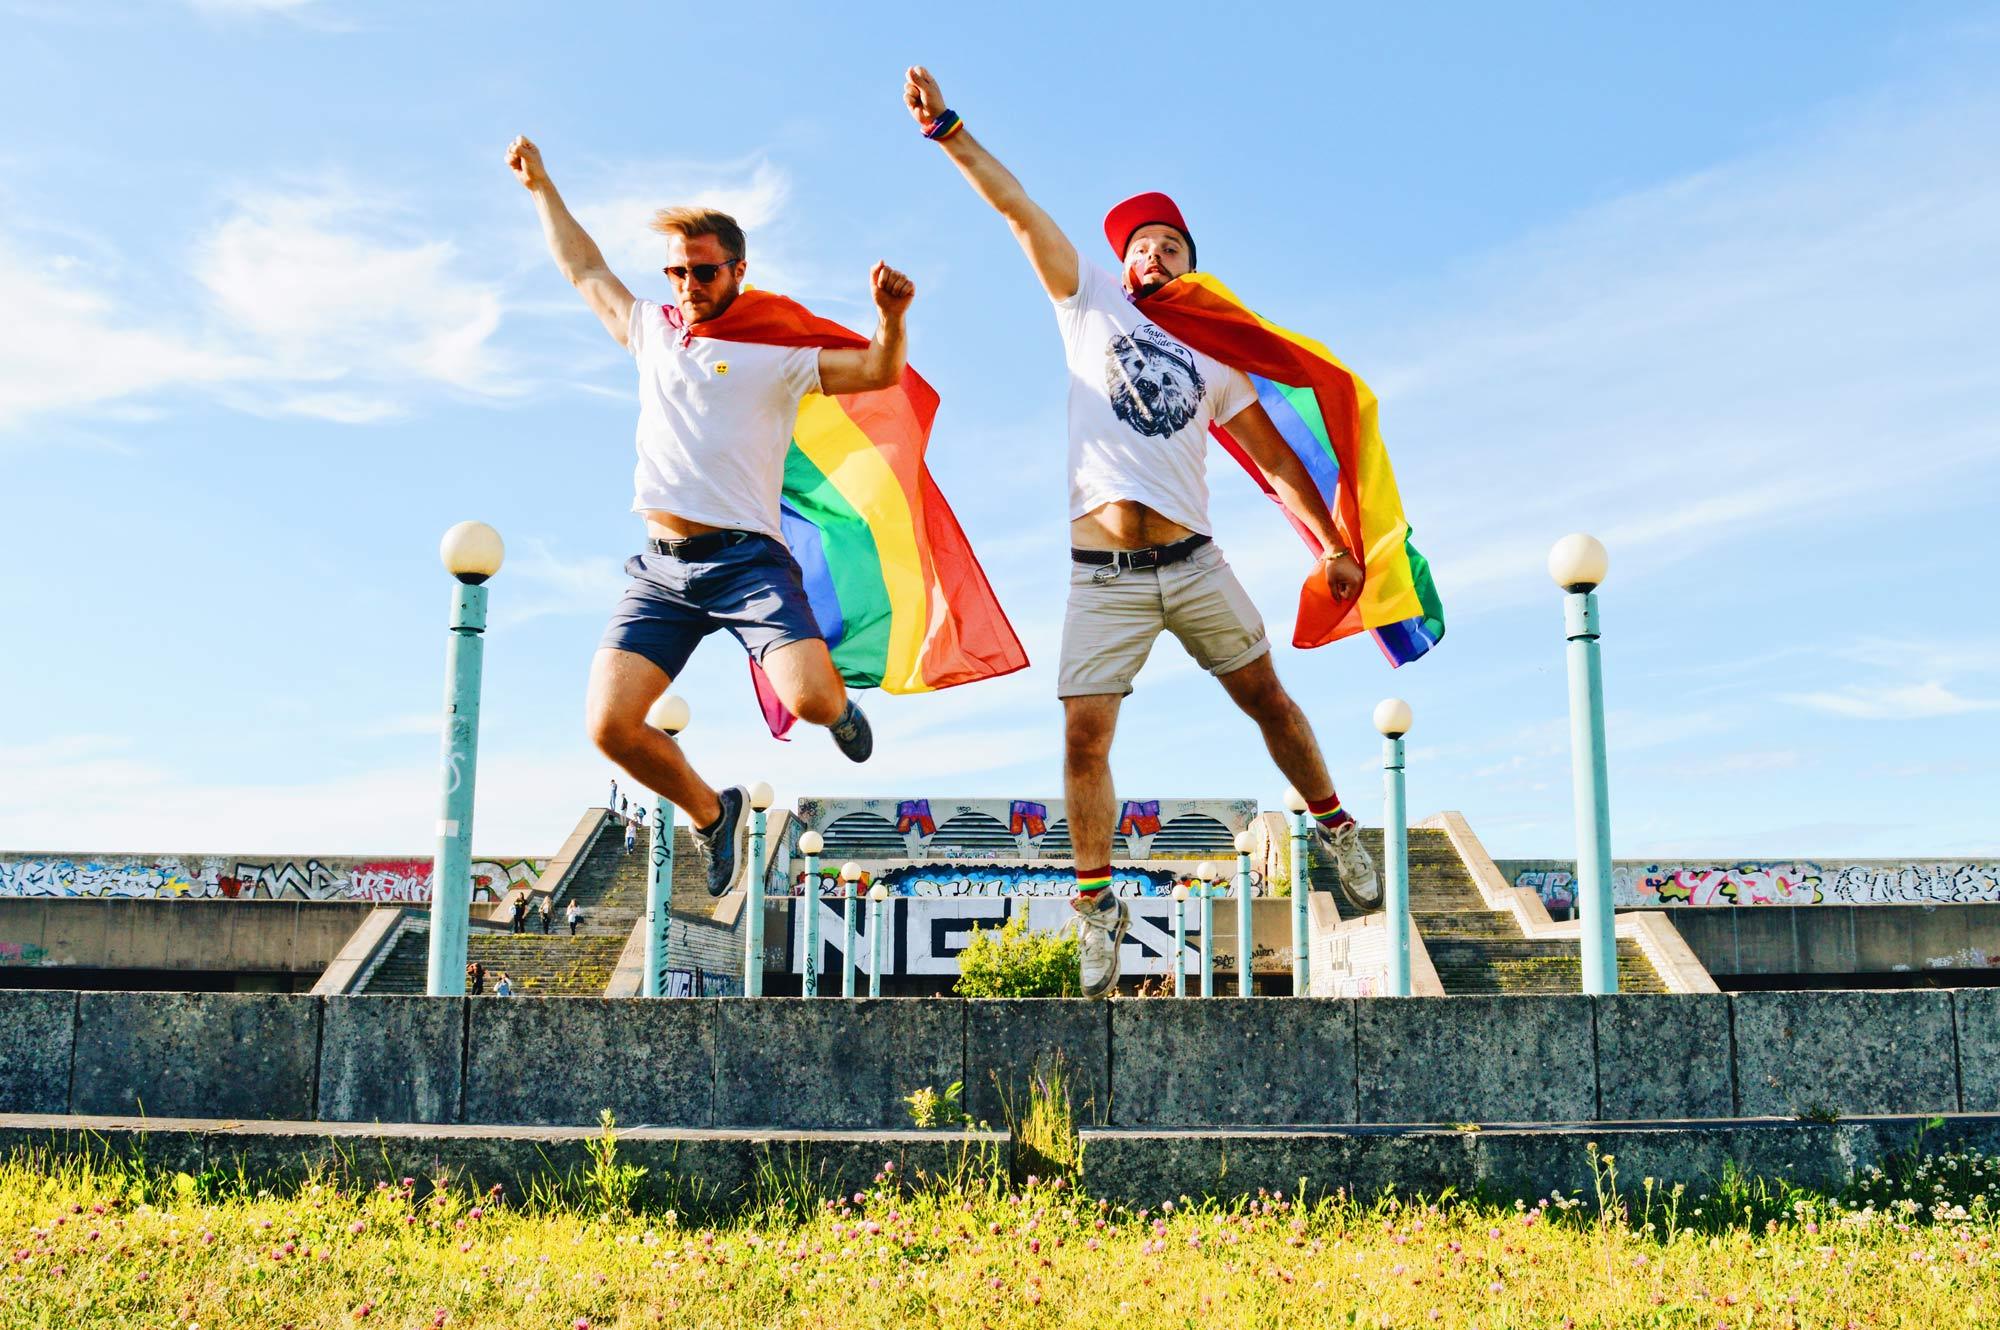 Gay Super Heroes Supergay Baltic Pride 2017 Tallinn Best Powerful LGBTQ Photos © CoupleofMen.com